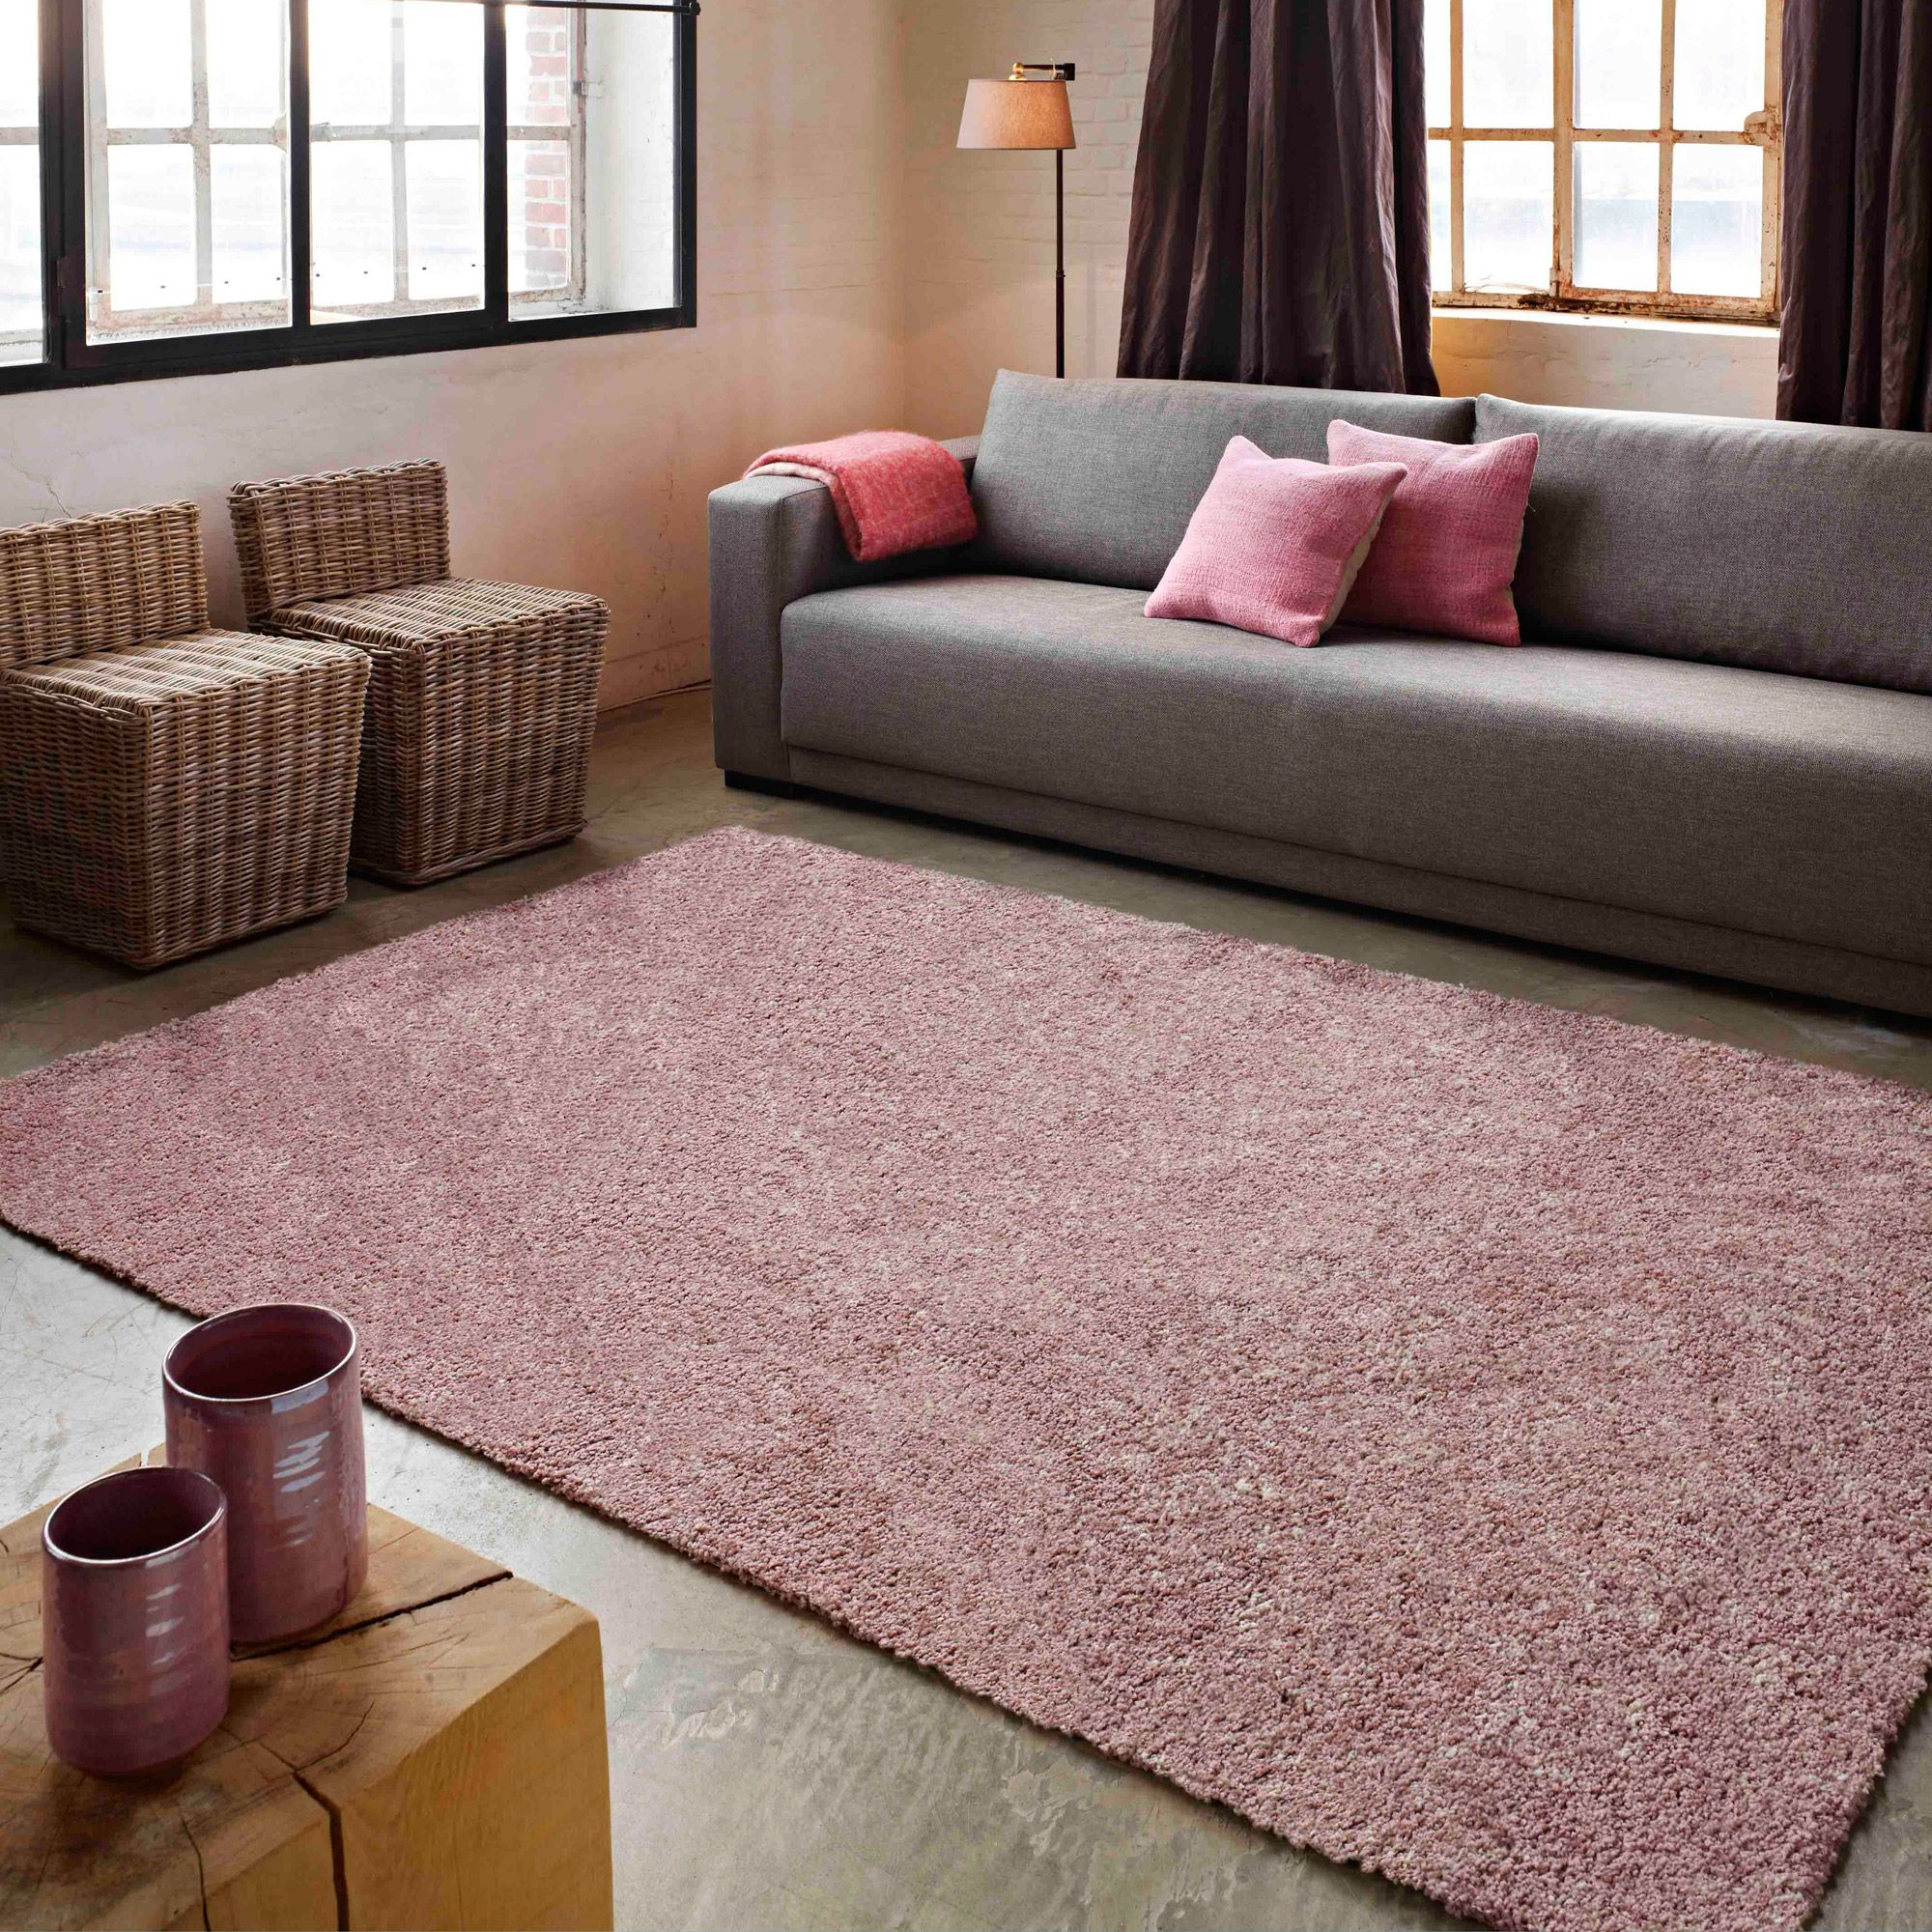 tapis 100 polypropyl ne heatset fris uni rose rose pinterest tapis fris et chaleureuse. Black Bedroom Furniture Sets. Home Design Ideas